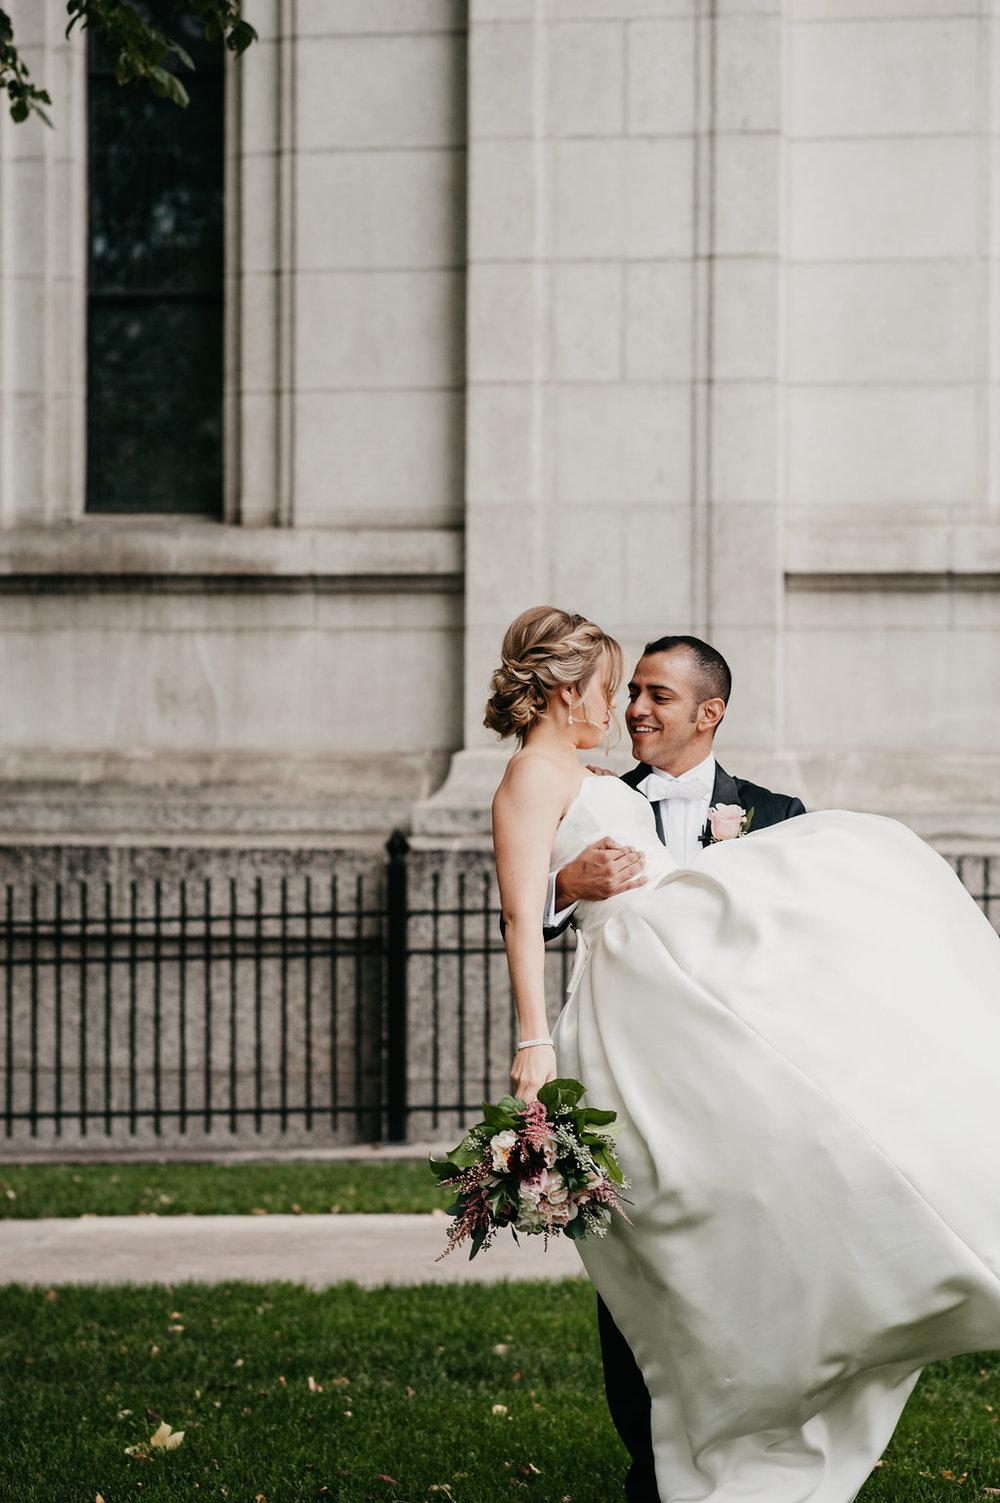 Minnesota Wedding Photographer 46.jpg